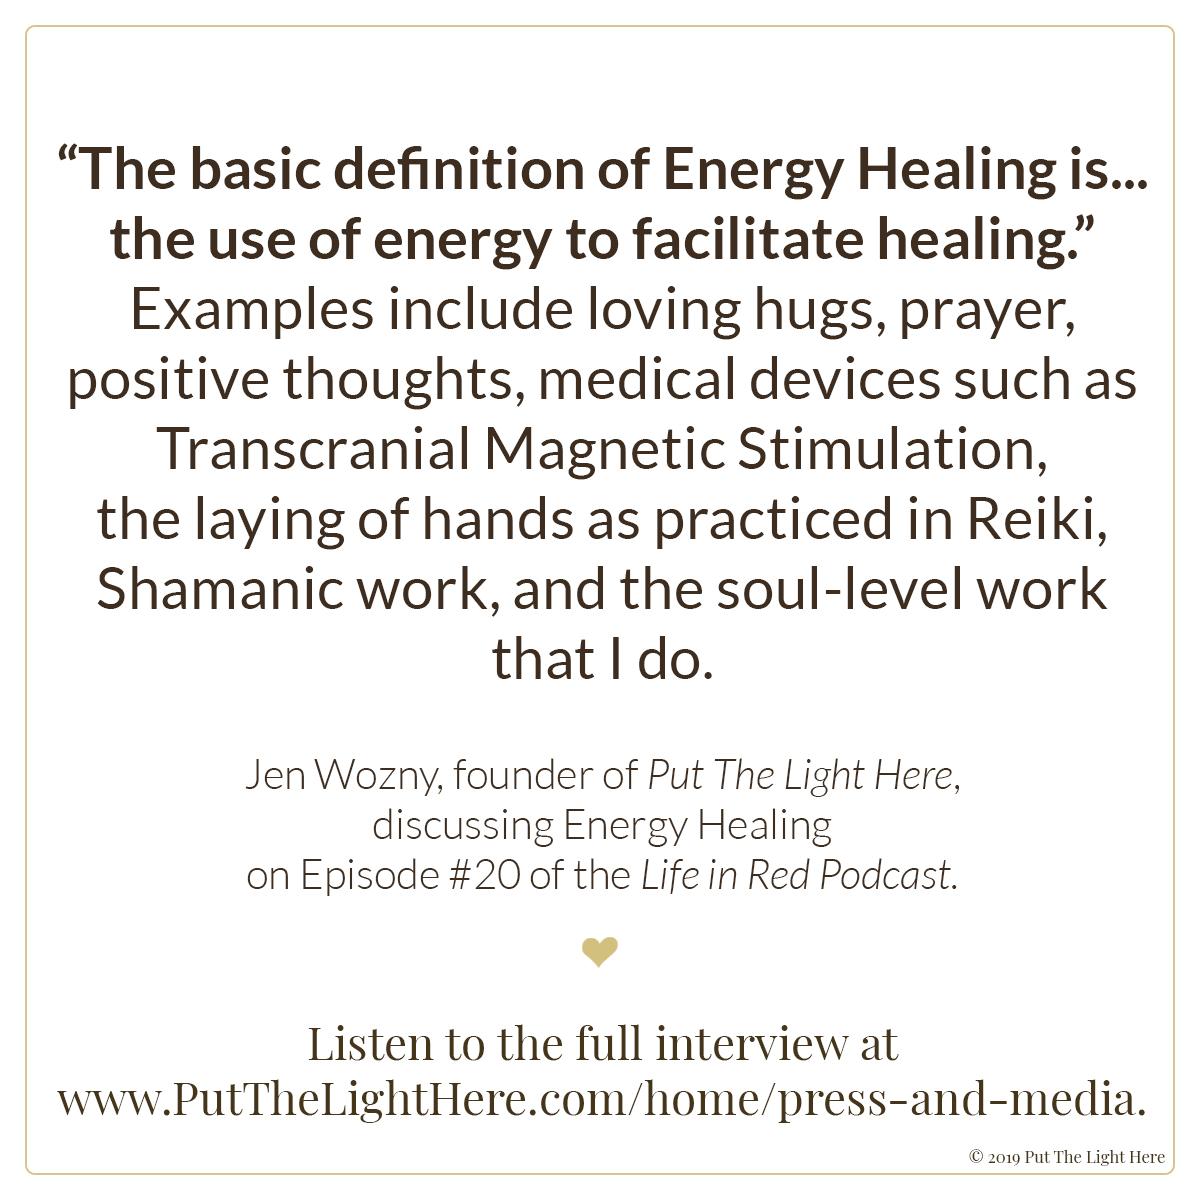 Energy Healing - Put The Light Here